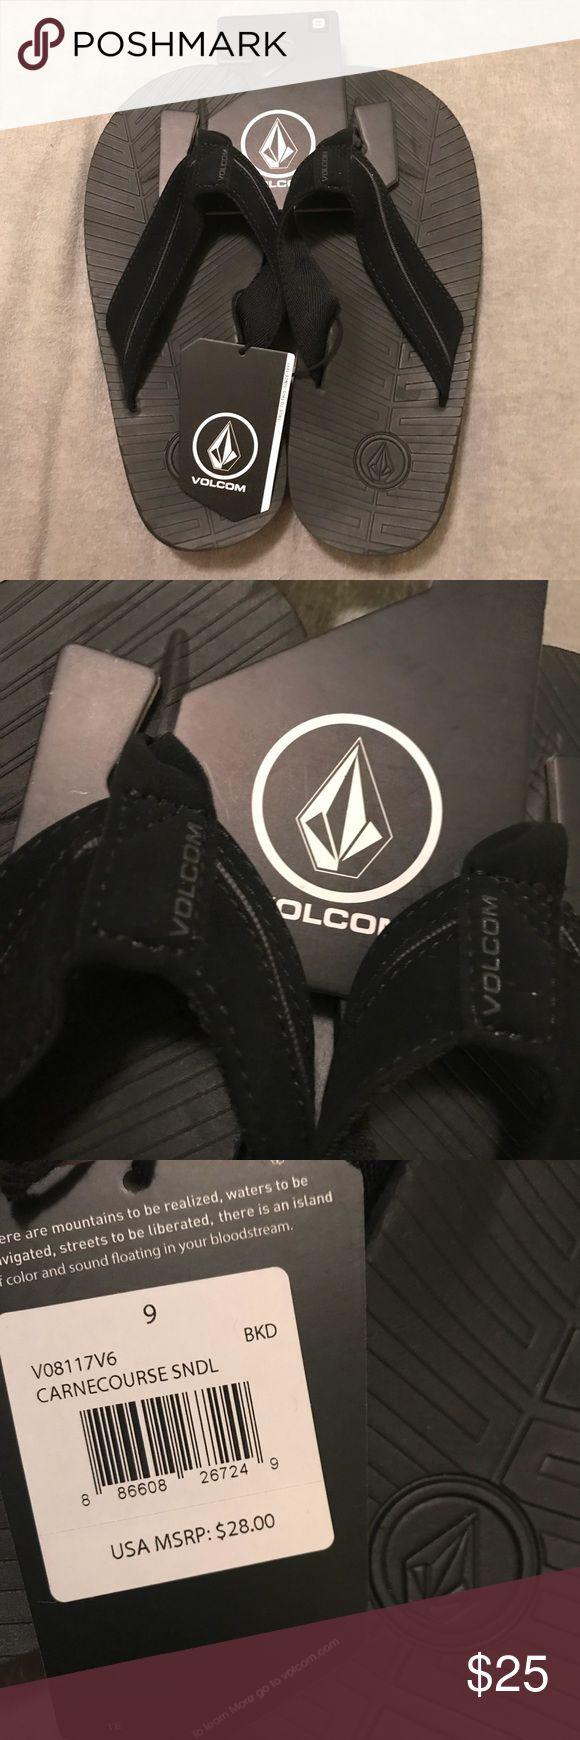 VOLCOM Mens Size 9 black flip flops NWT NWT Black Volcom Mens flip flops. Size 9 Volcom Shoes Sandals & Flip-Flops